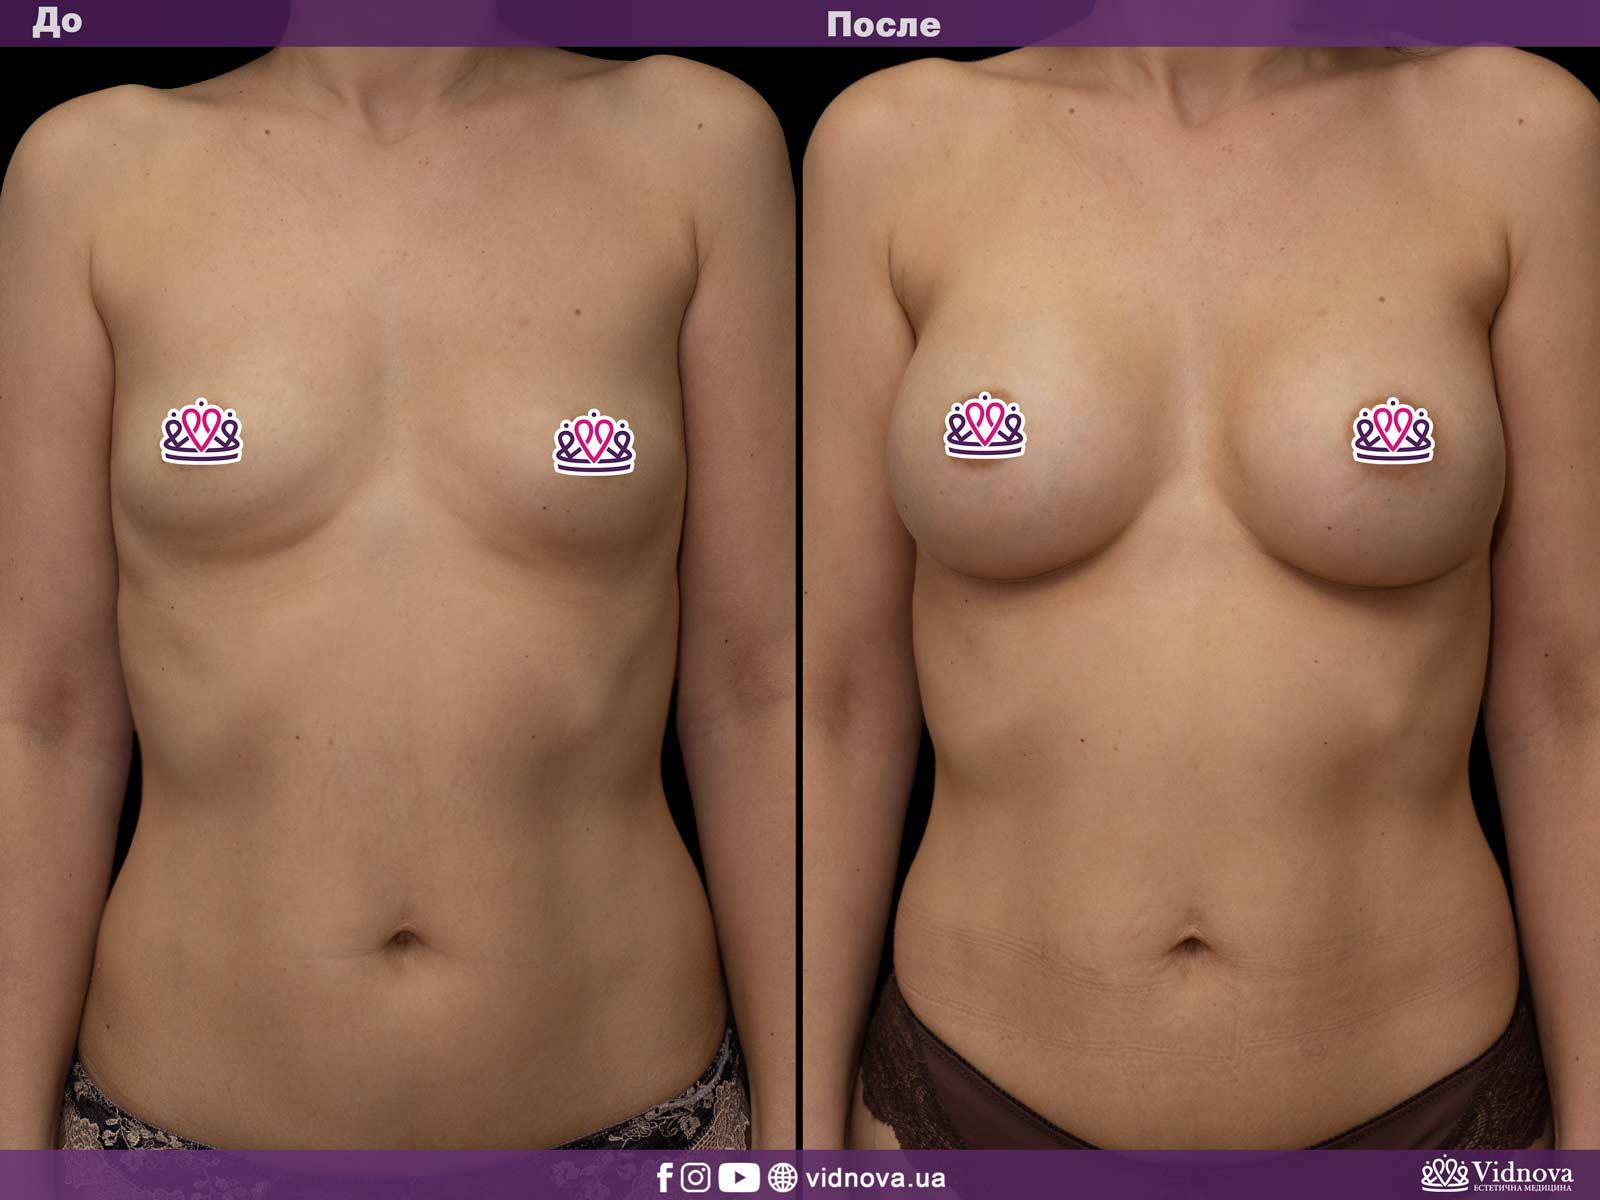 Увеличение груди: Фото ДО и ПОСЛЕ - Пример №15-1 - Клиника Vidnova